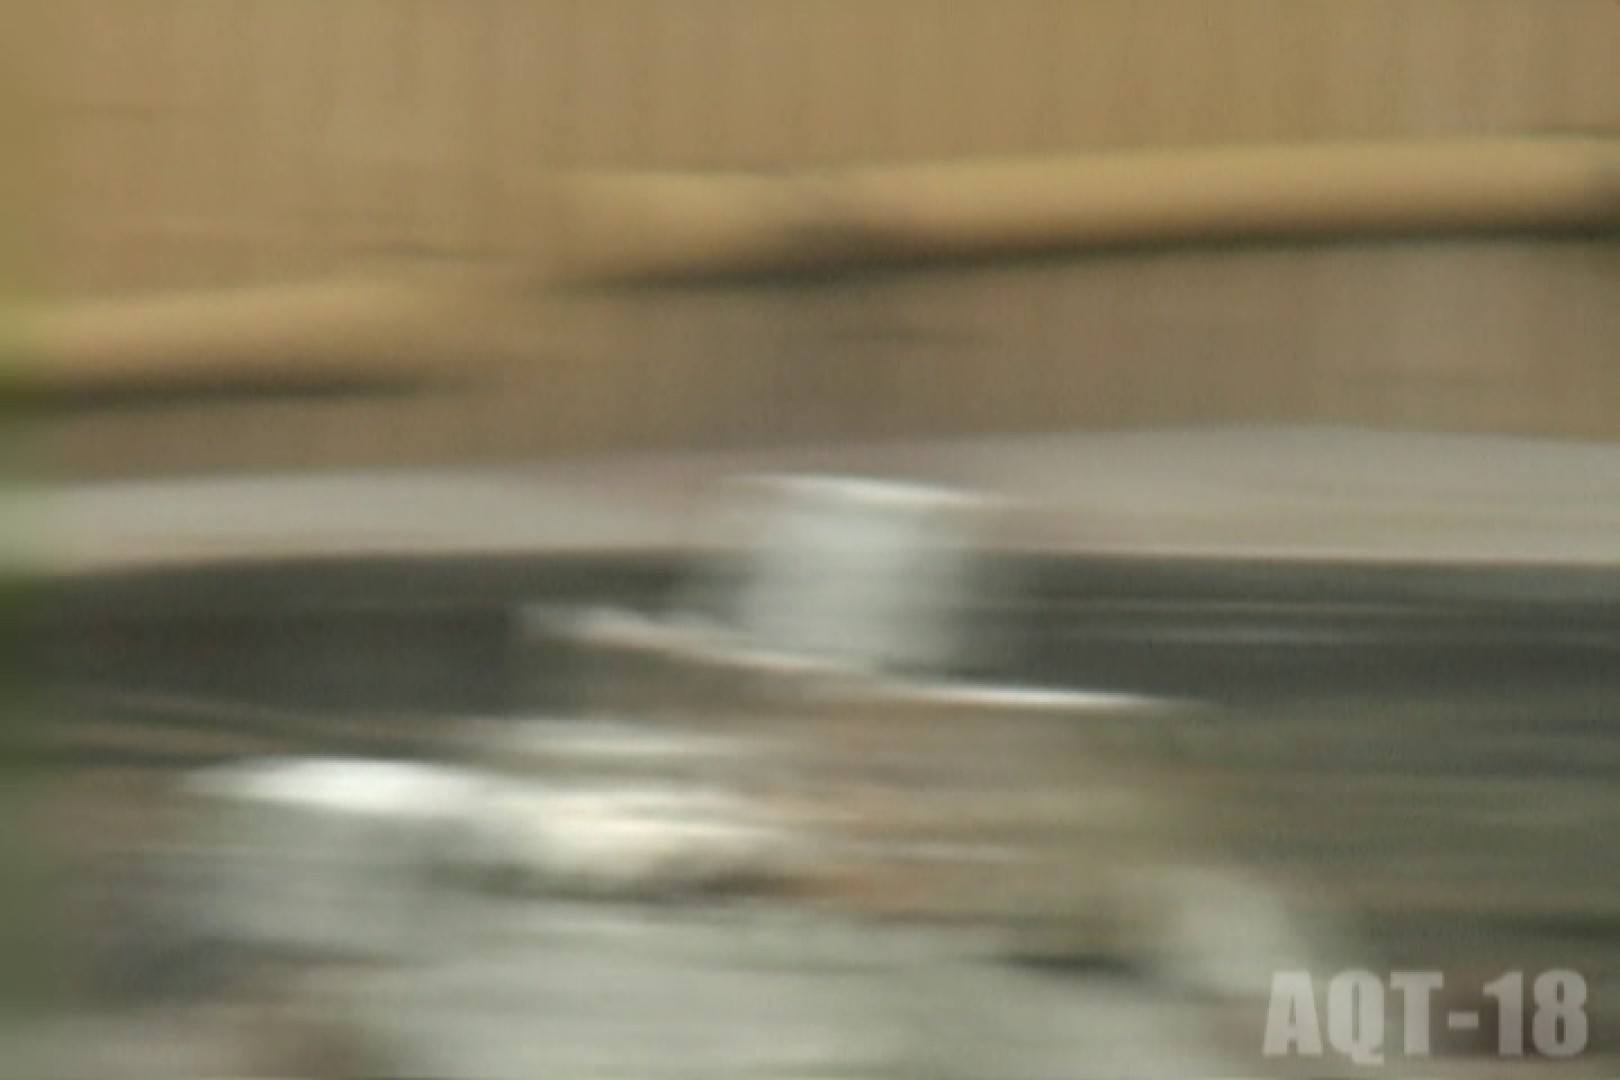 Aquaな露天風呂Vol.864 盗撮 のぞき動画画像 68画像 56